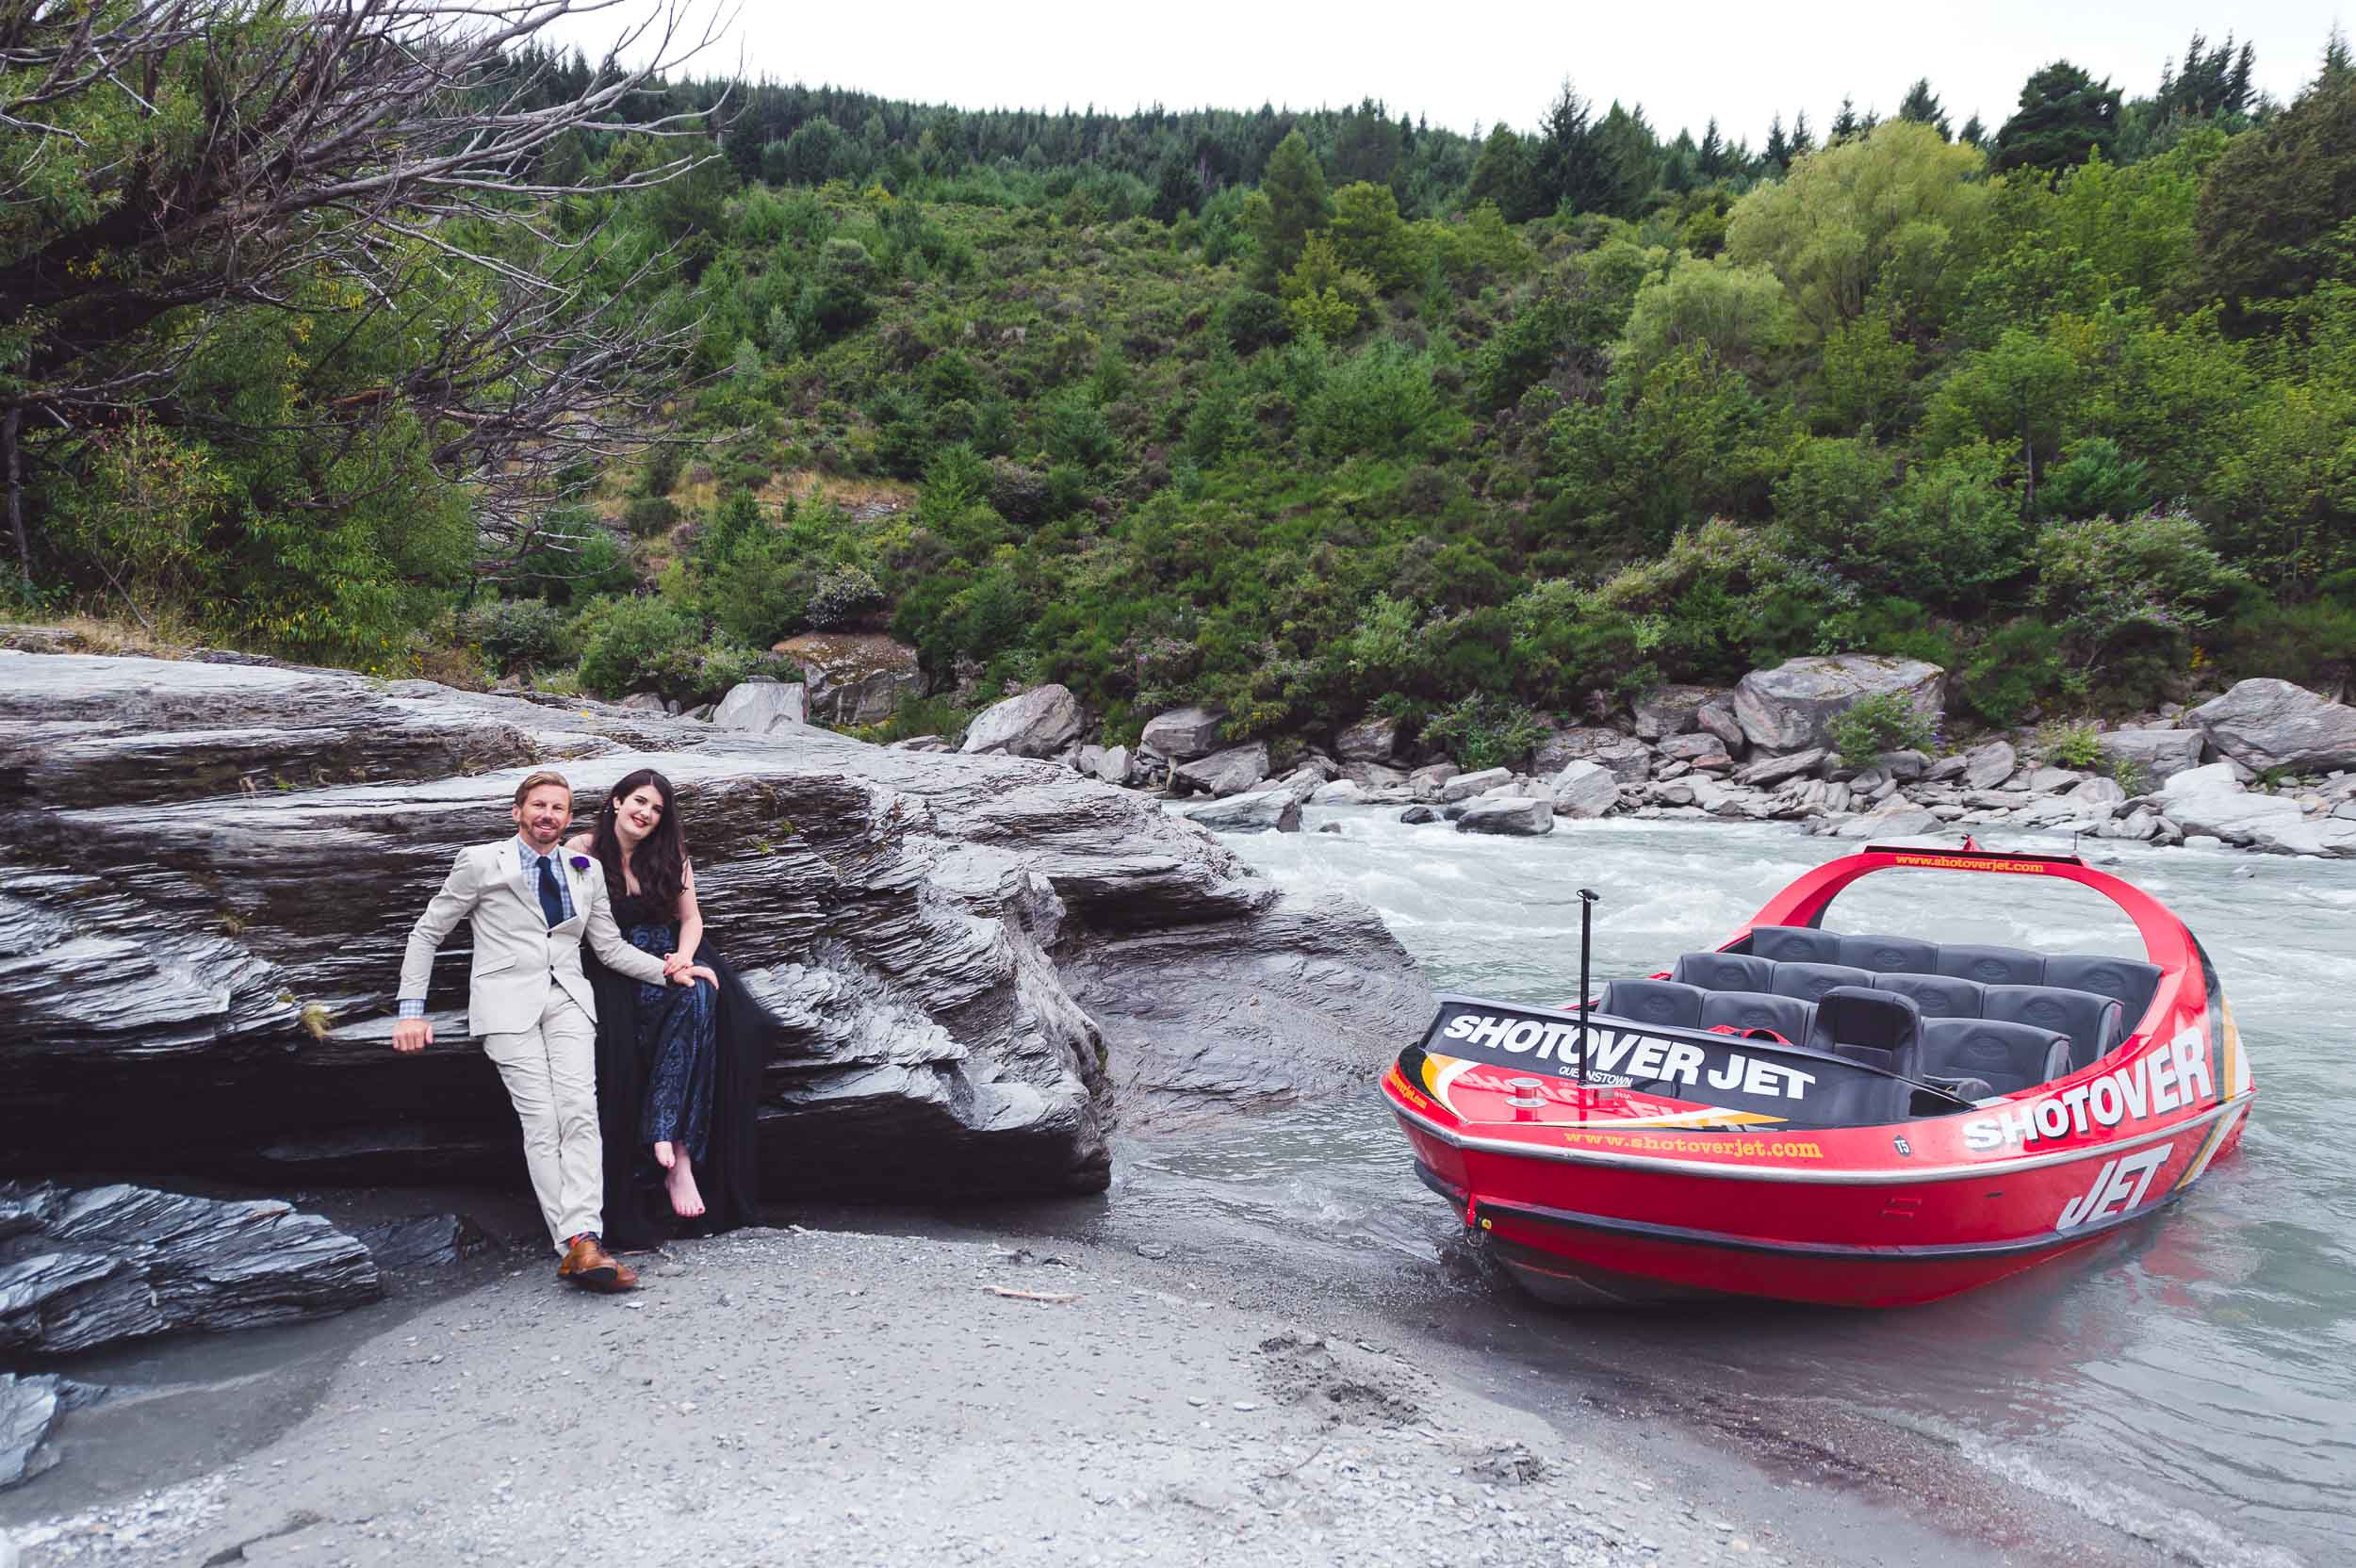 Shotover jet jetboat wedding